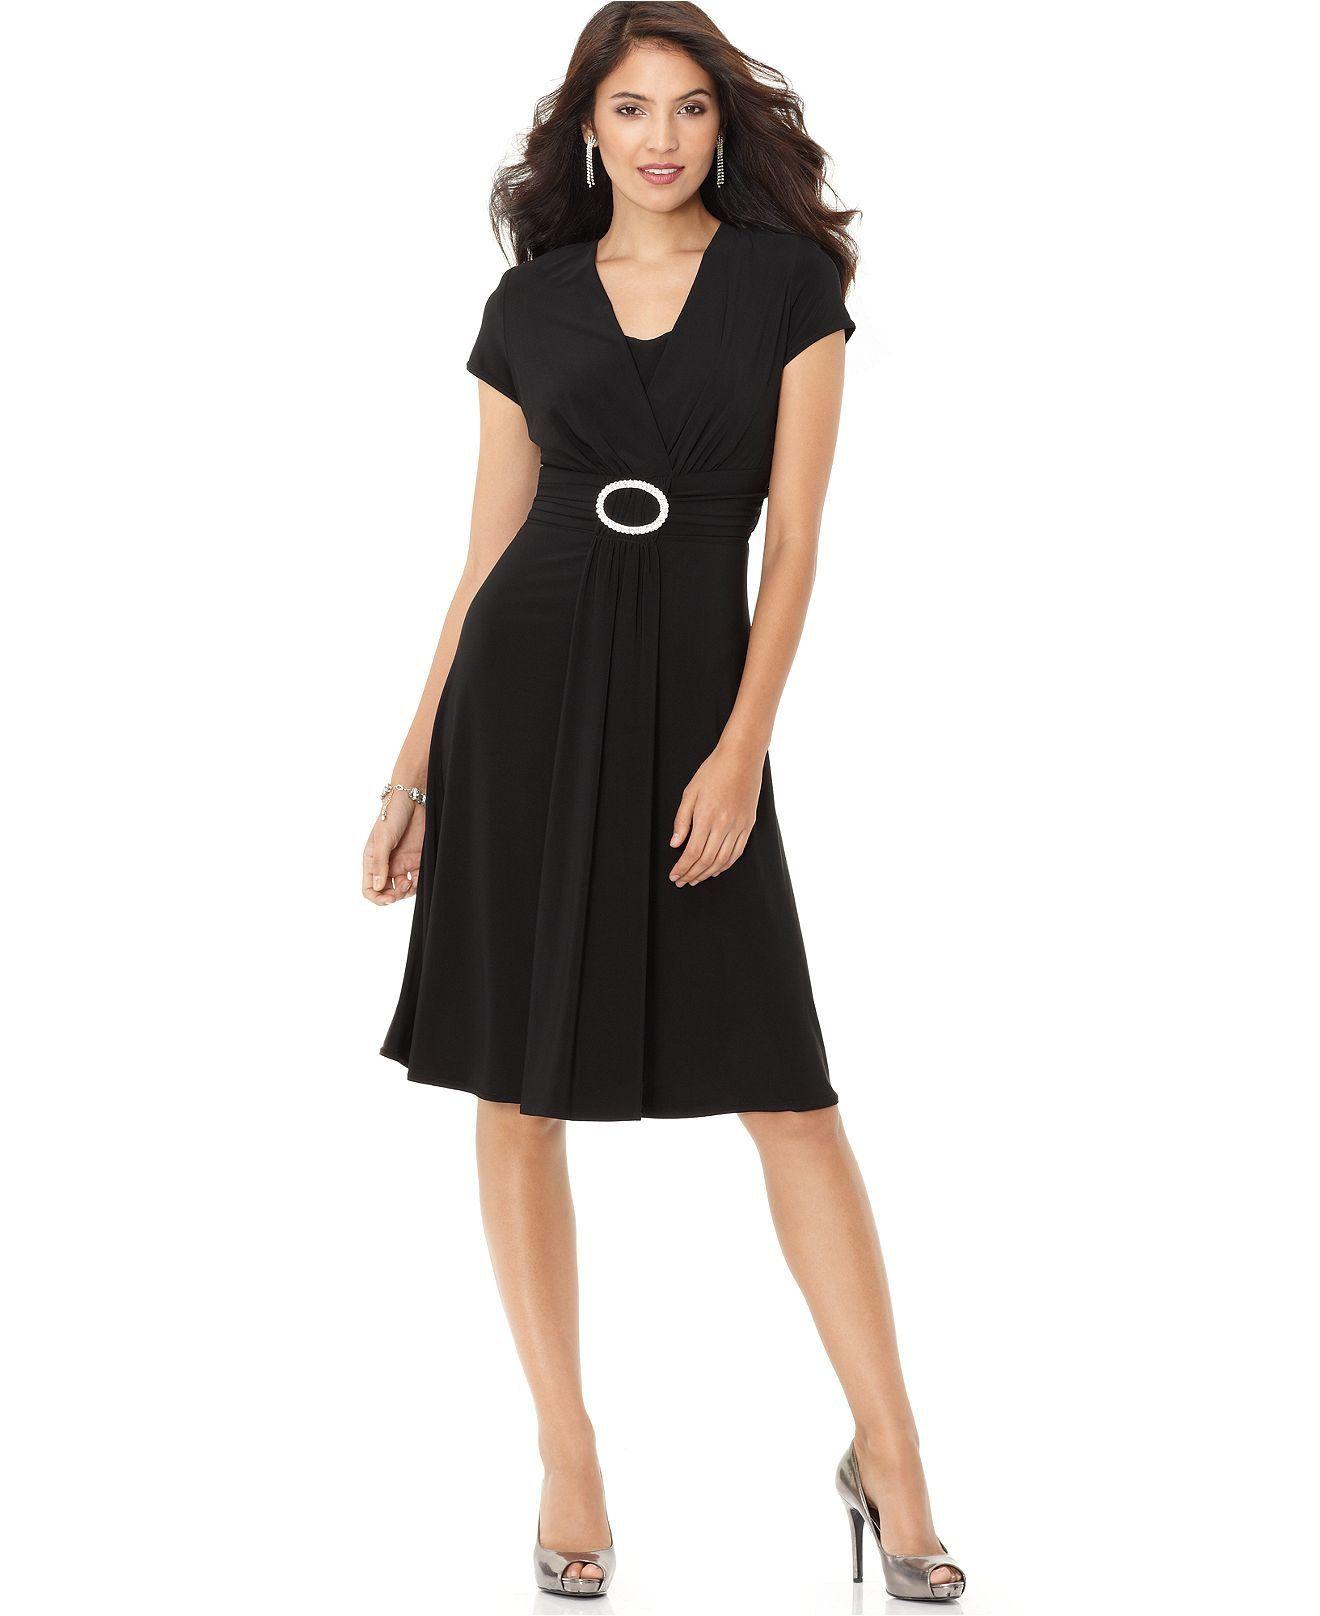 macys cocktail dresses | Little Black Dress - Evening Dresses ...